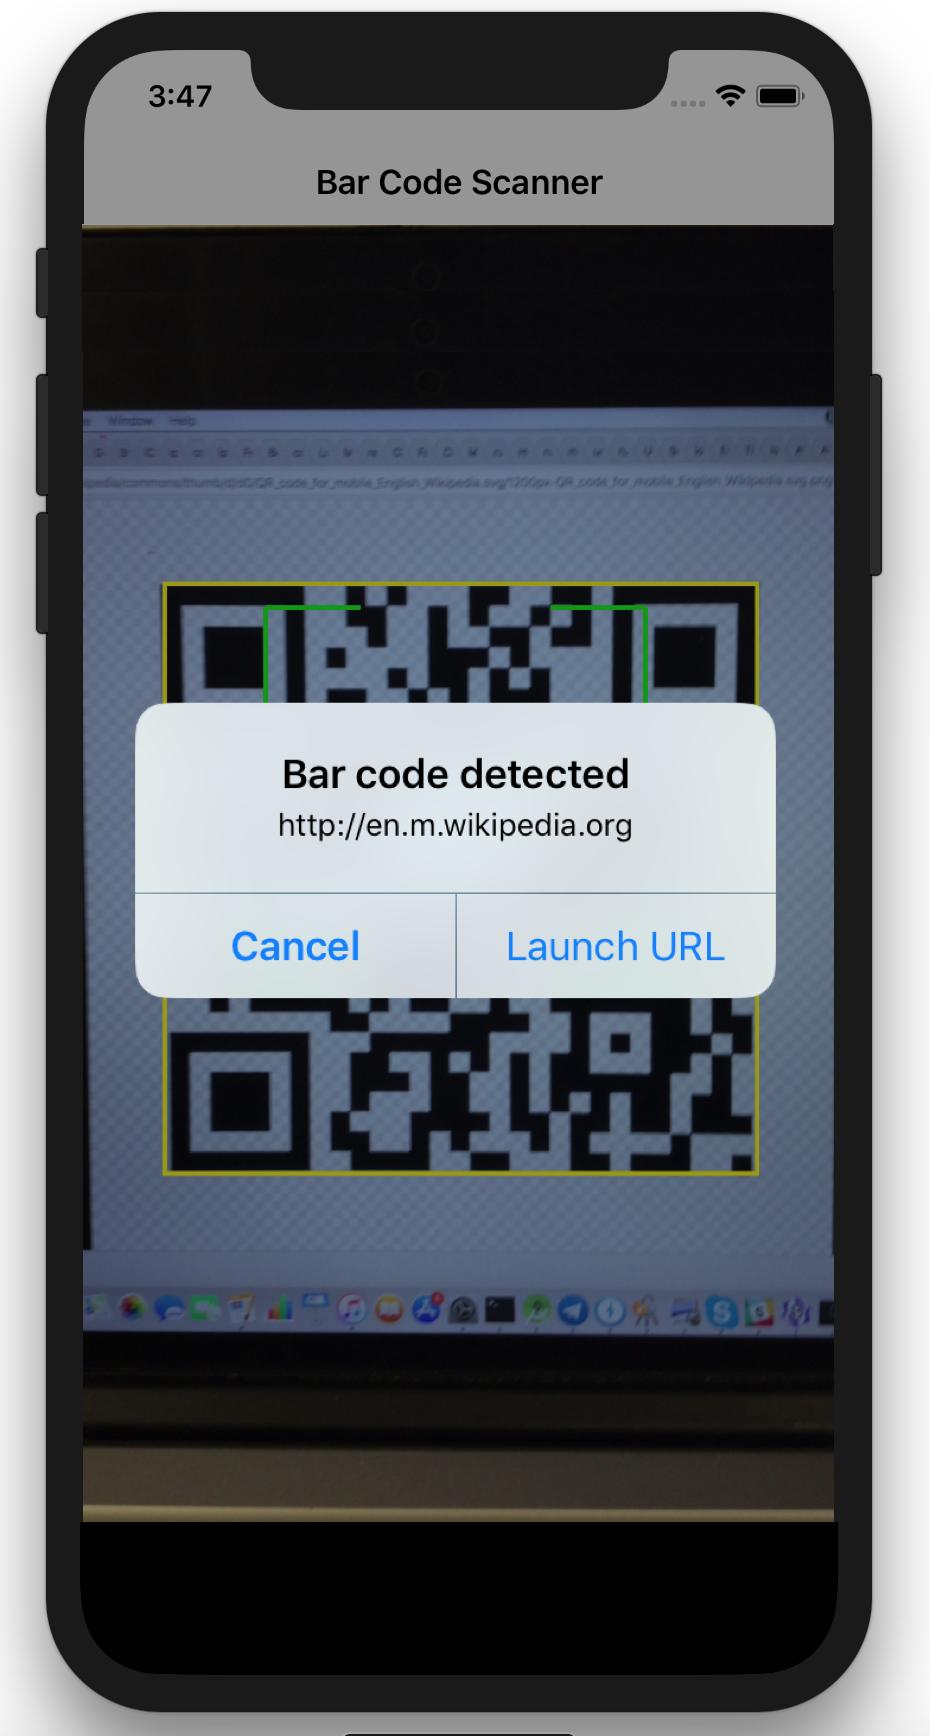 Native Bar Code Scanning in iOS